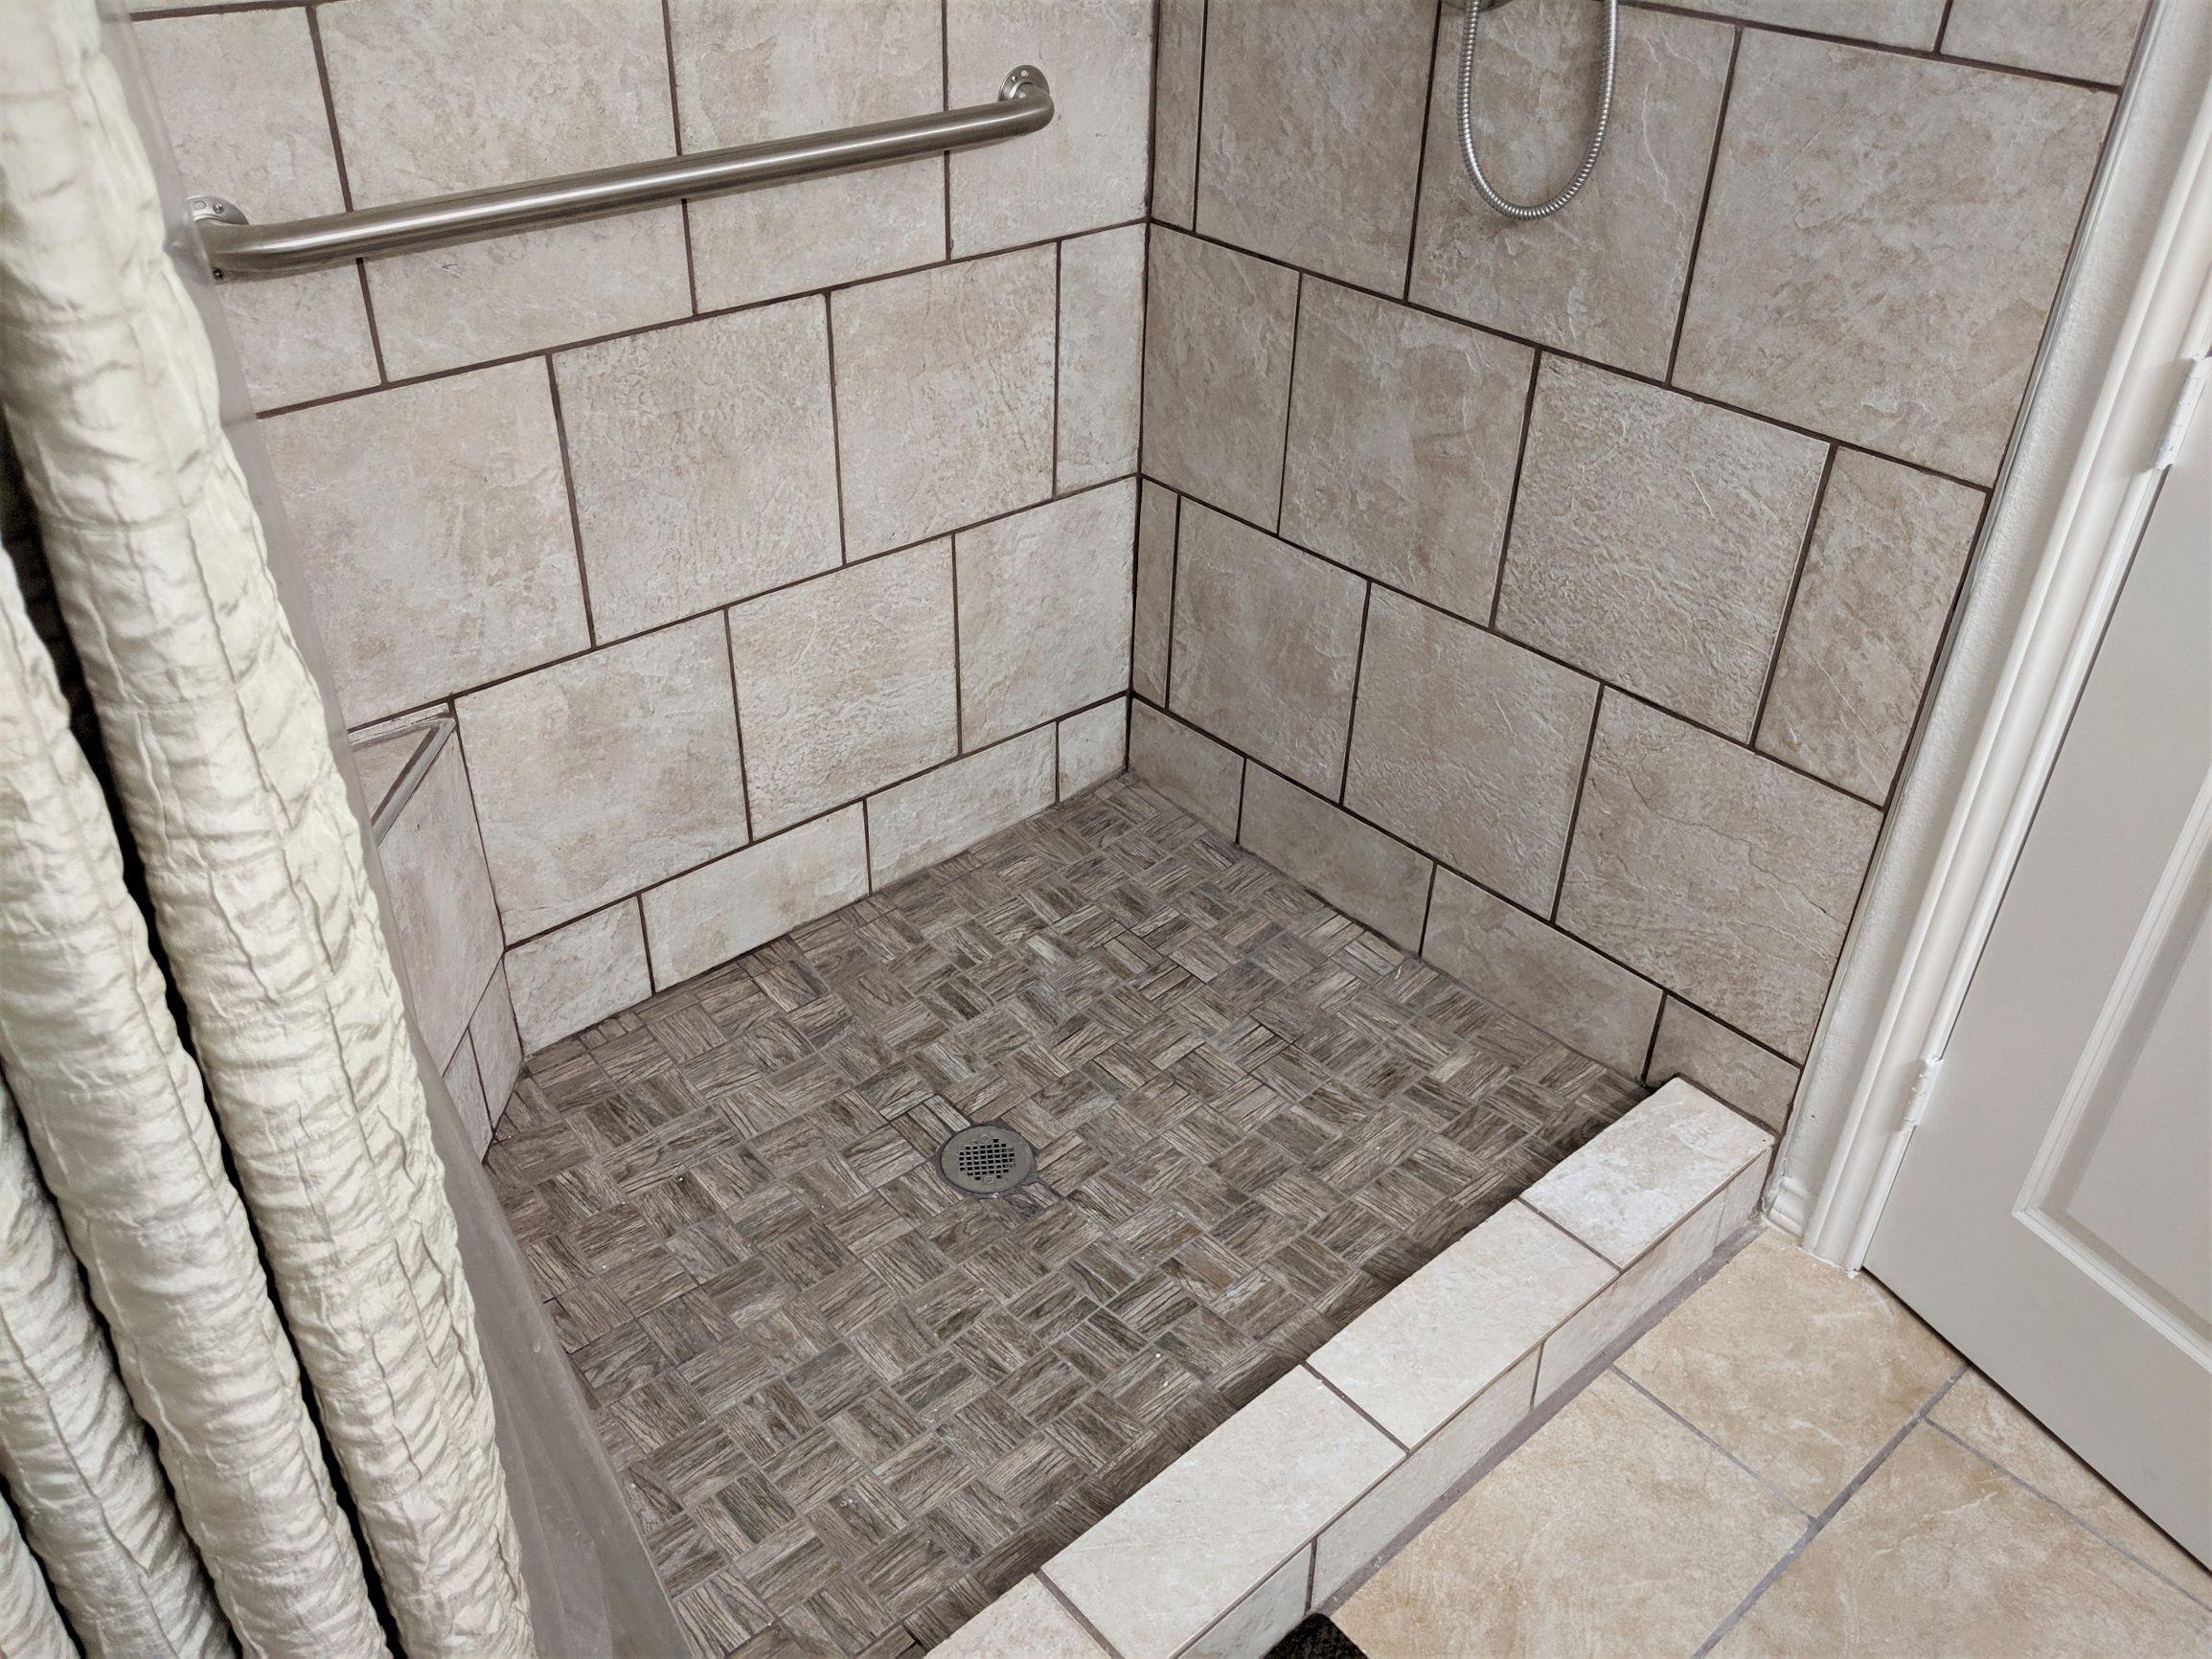 Habitat for Humanity Bathroom Remodel